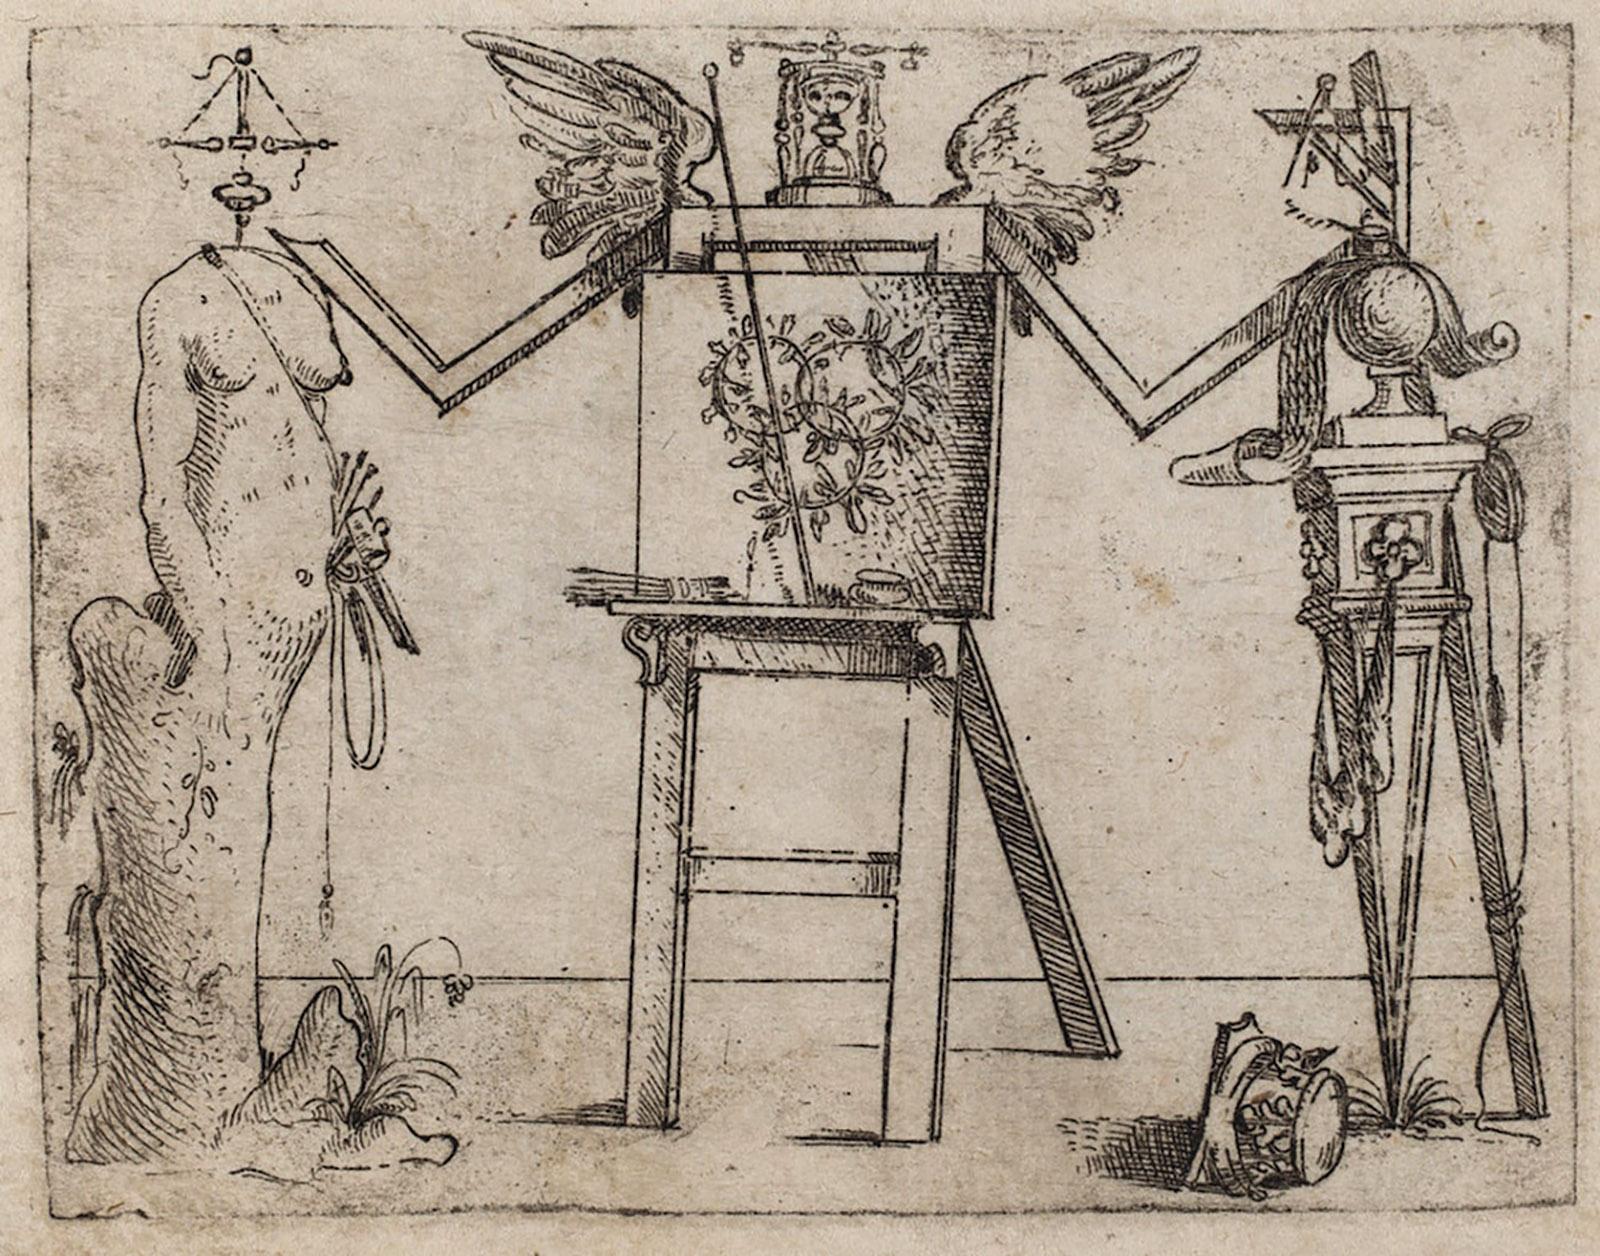 Etching by Giovanni Battista Bracelli